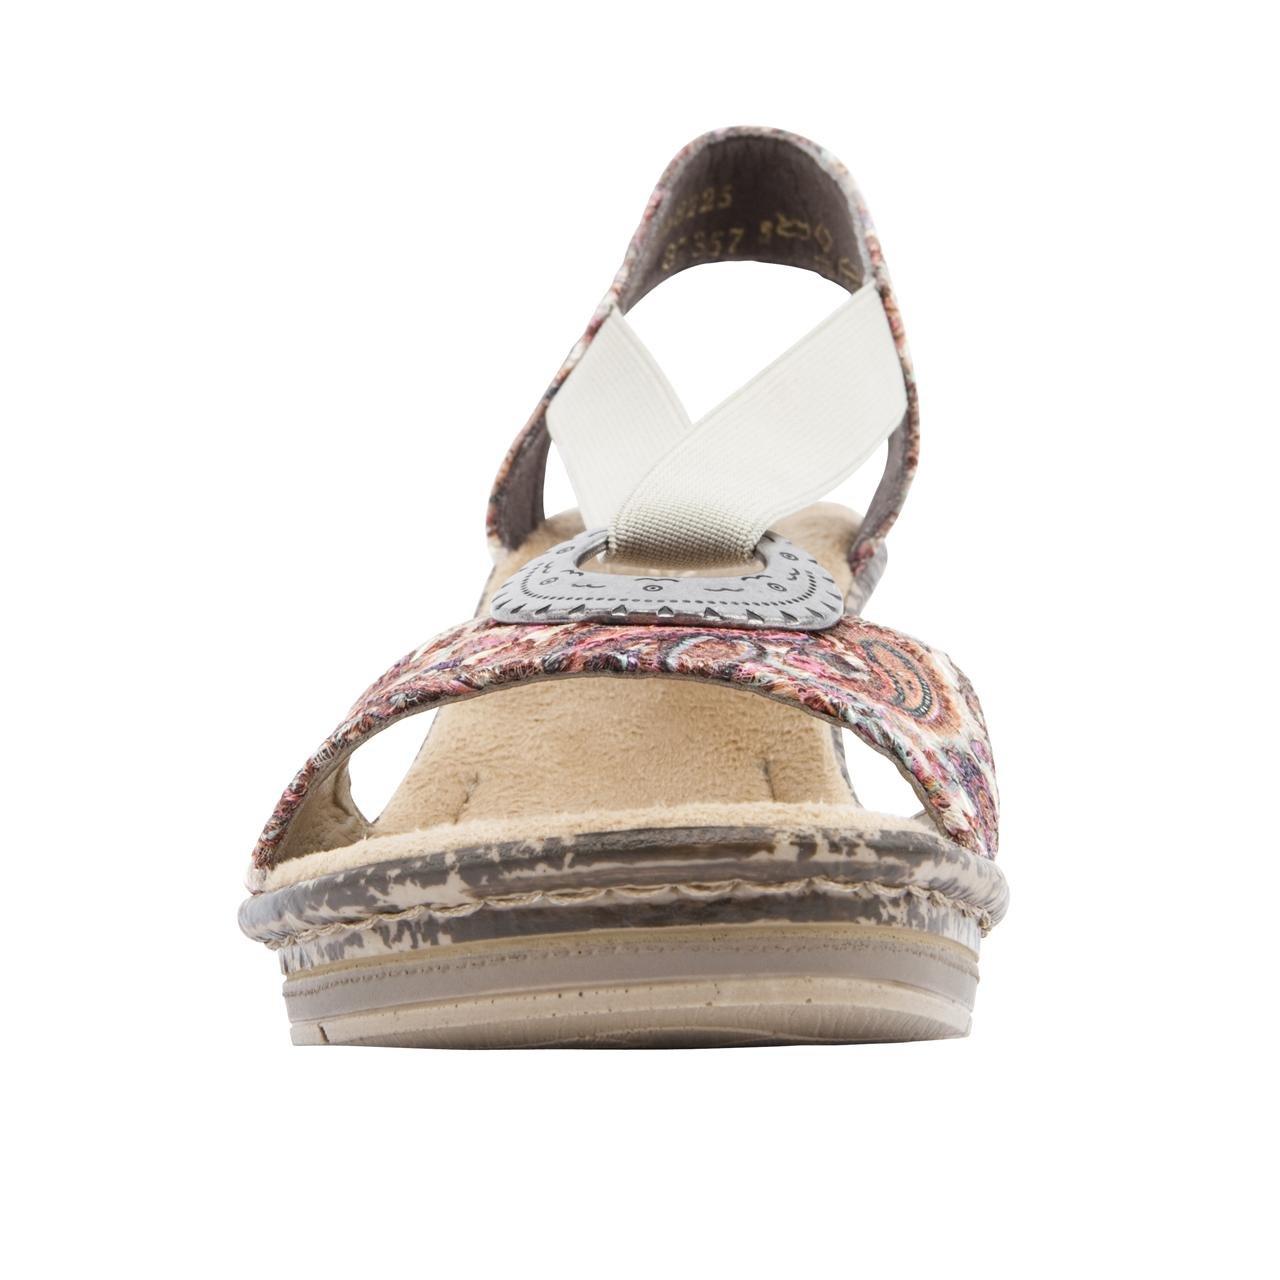 Rieker Ladies Roberta Sparkle Pink Wedge Sandals Size 8